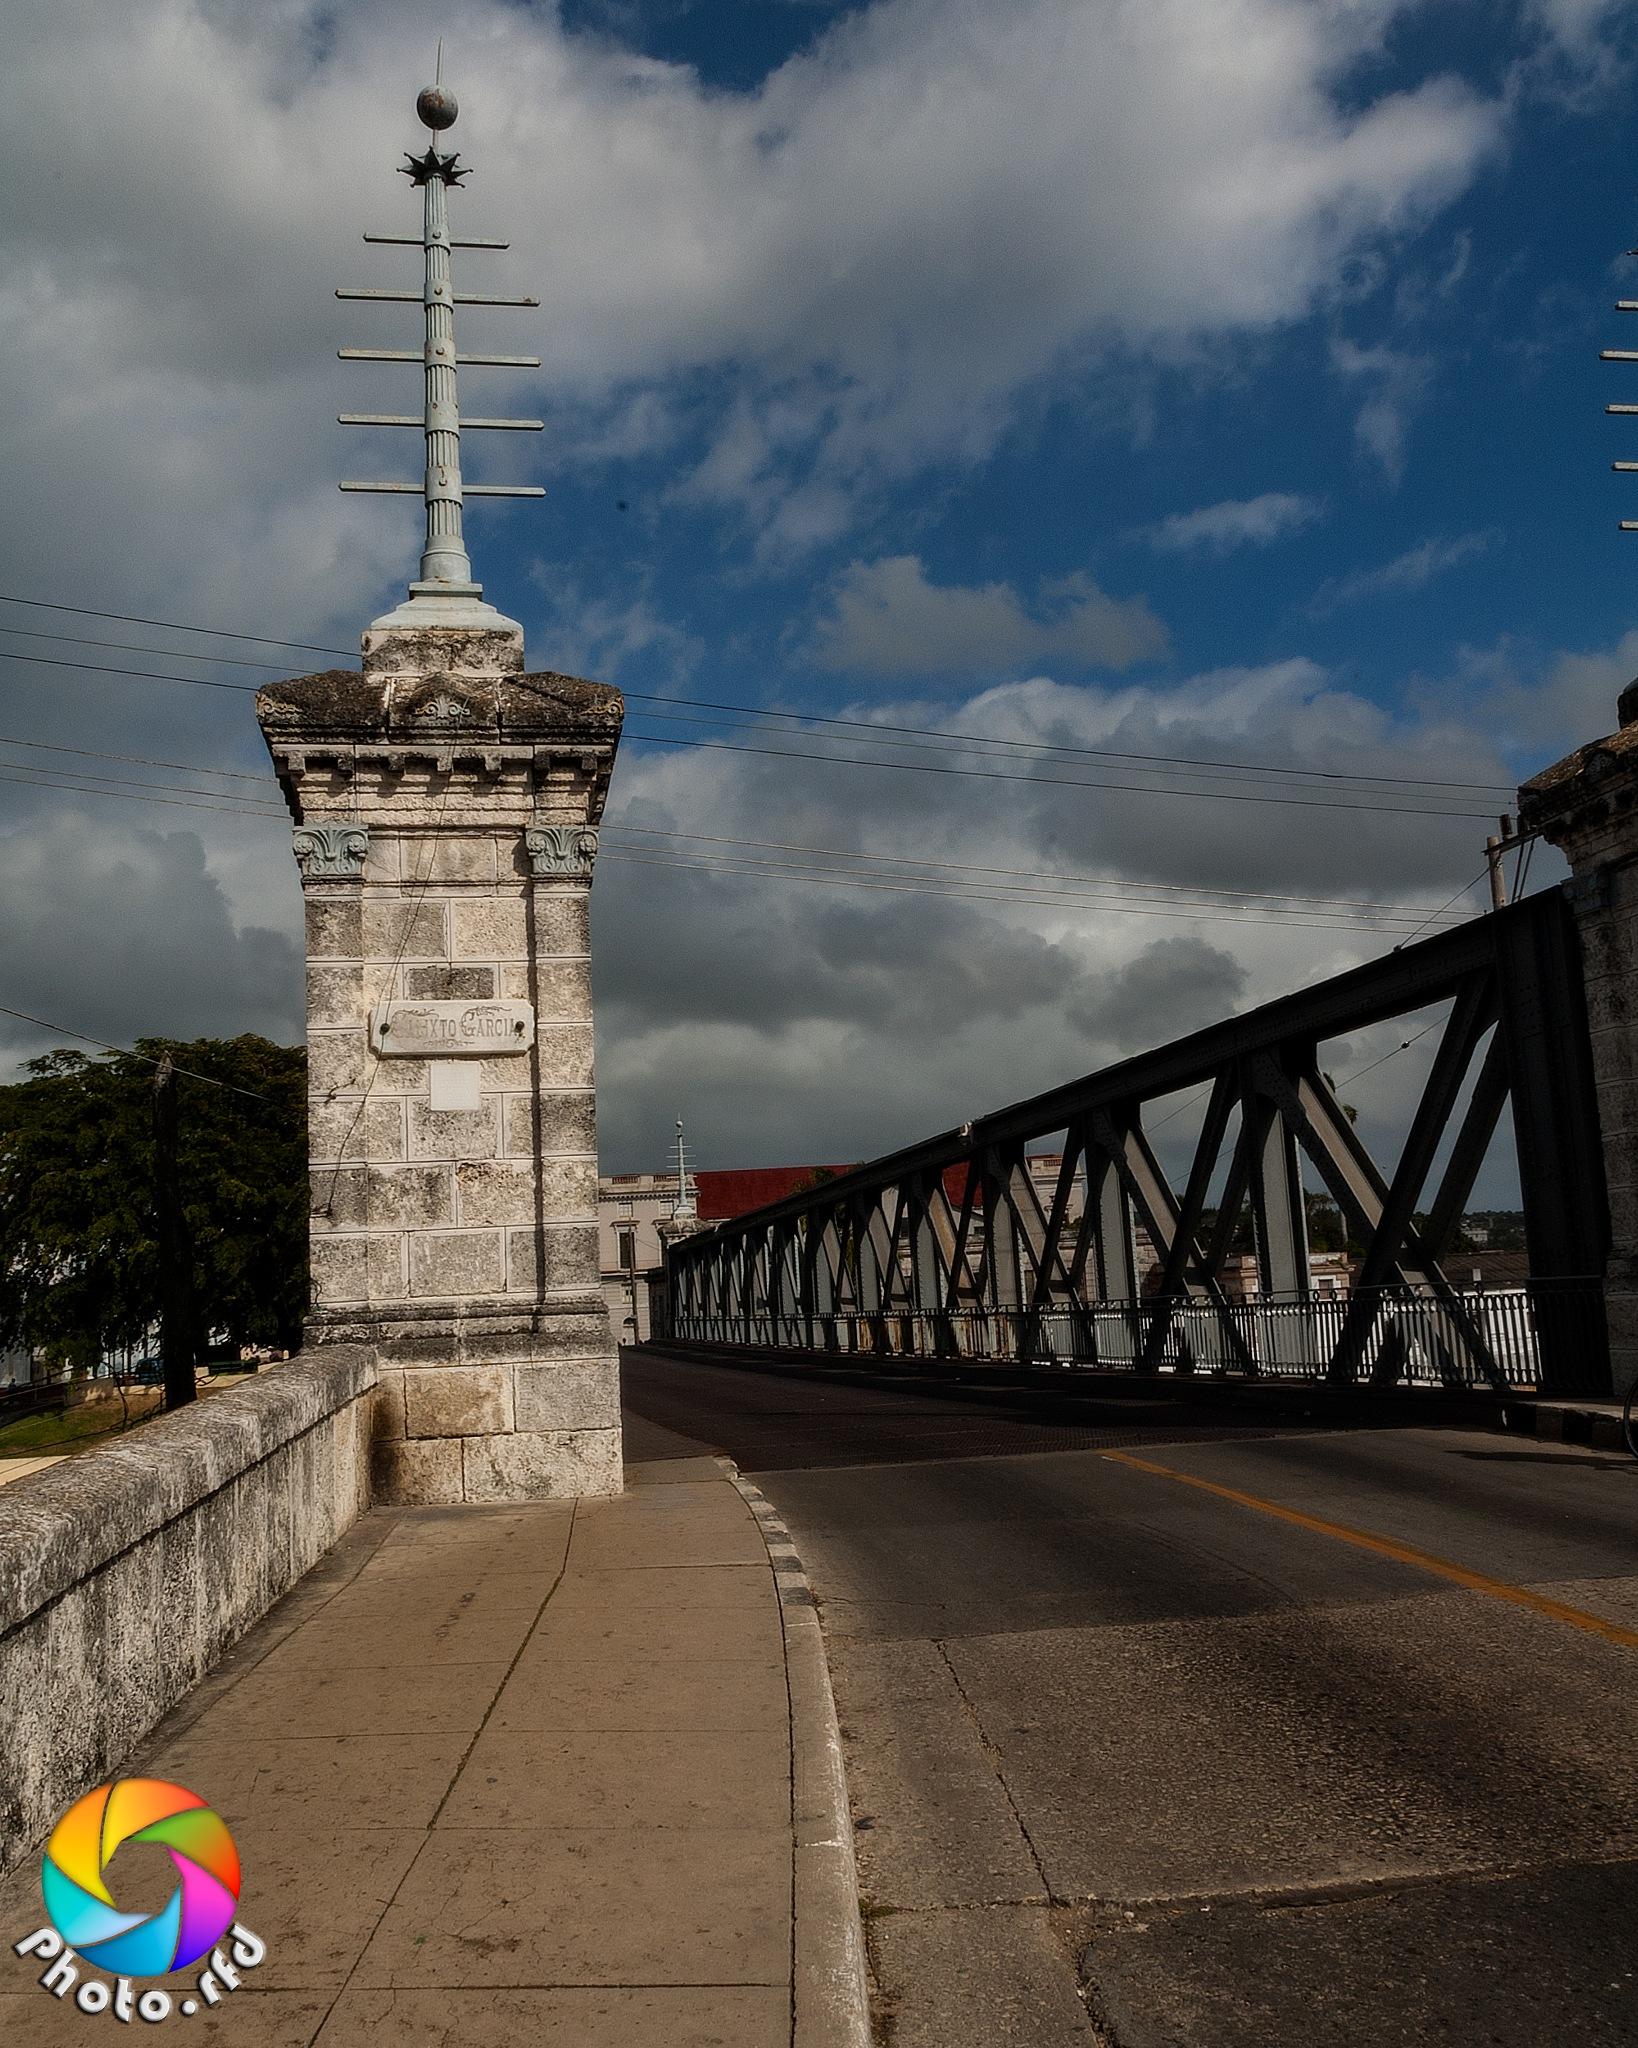 Bridge by Photo_rfd